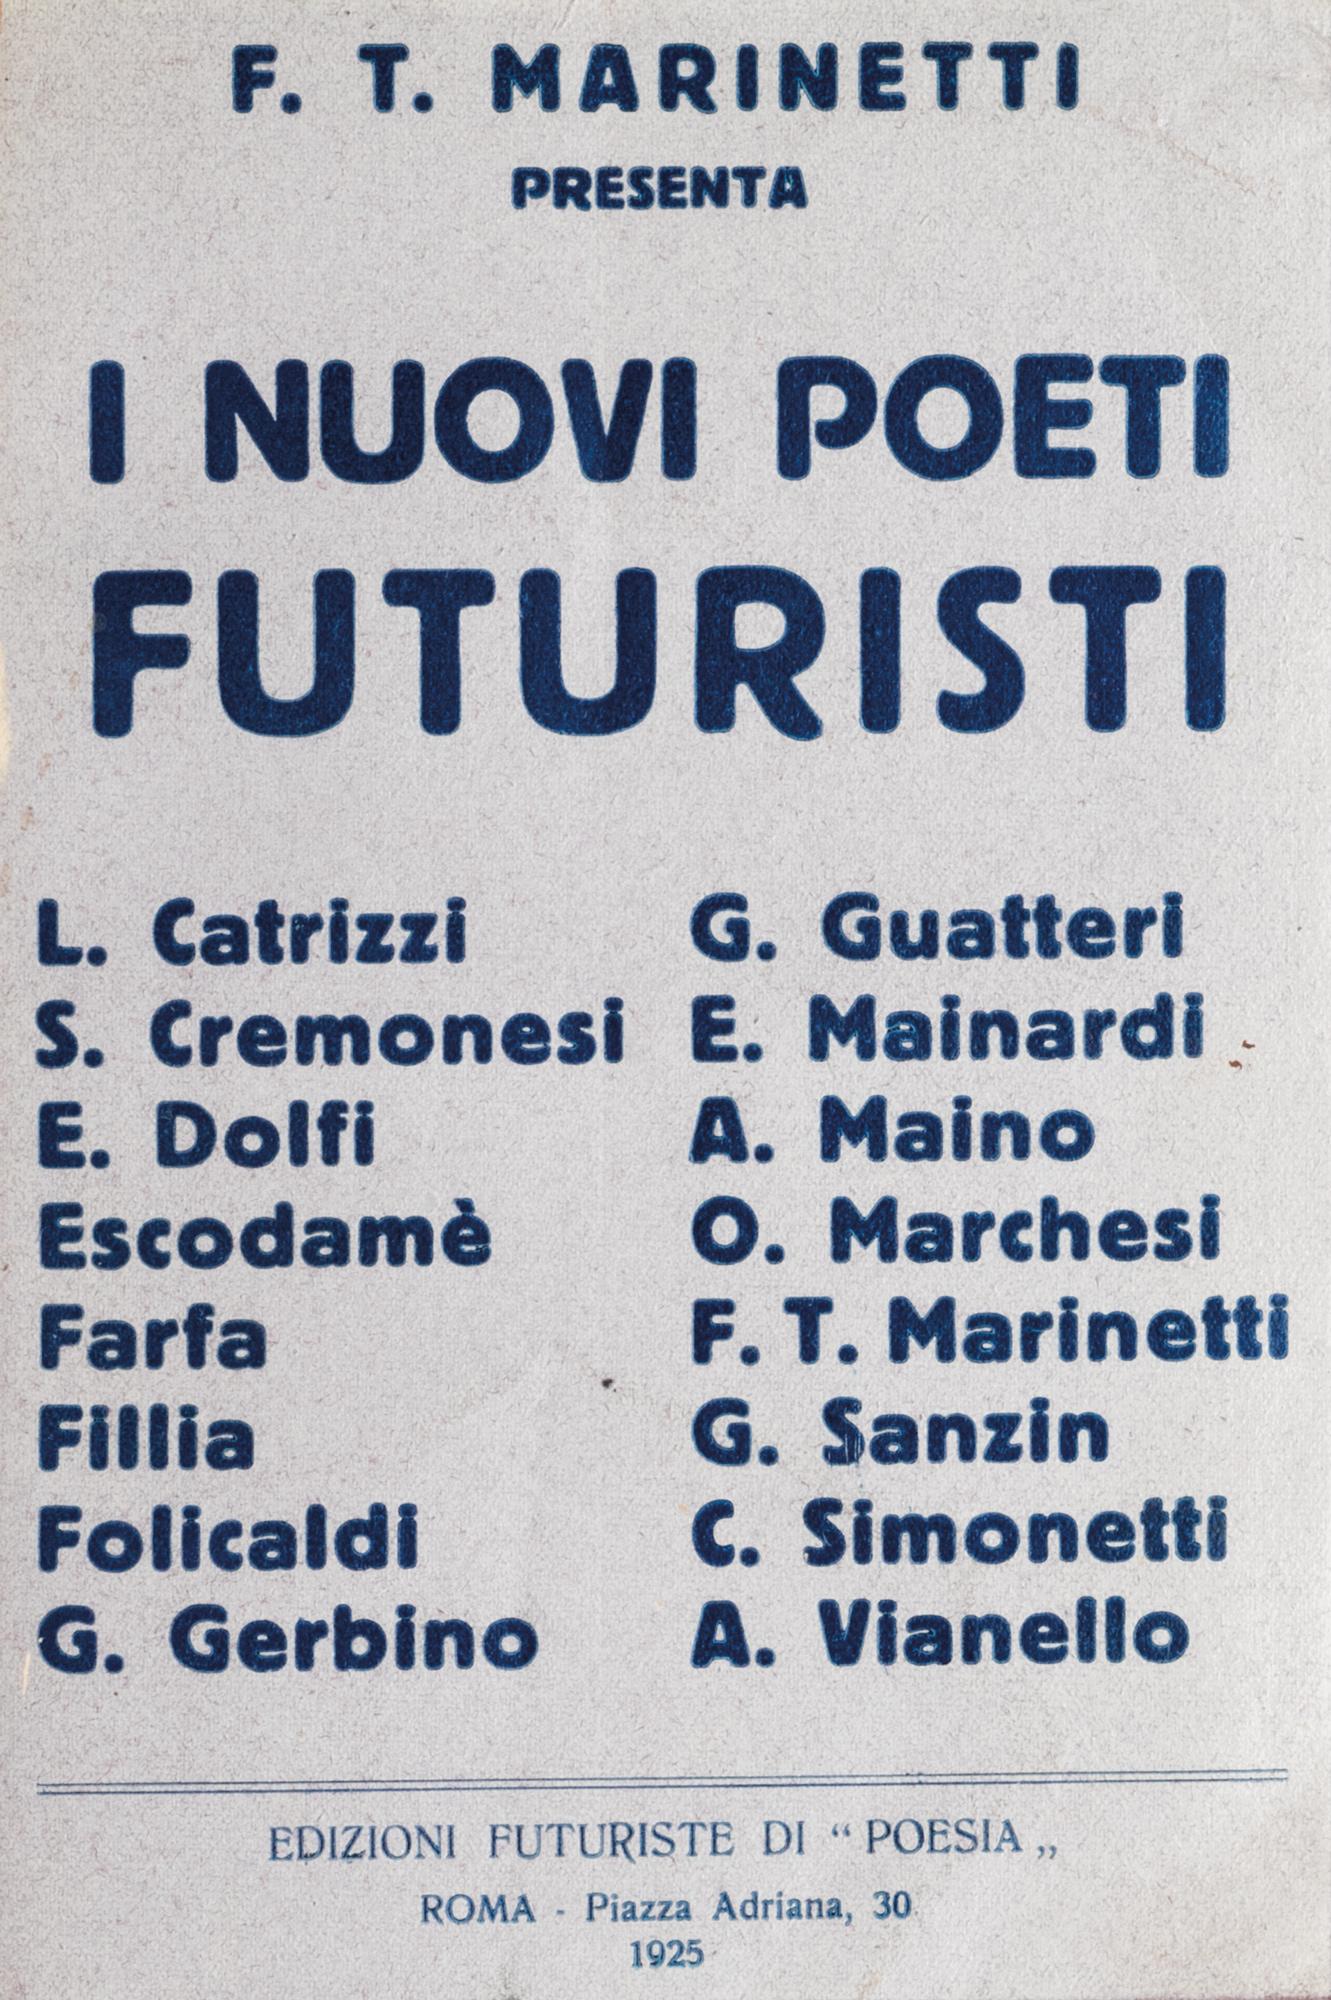 I nuovi poeti futuristi 1925